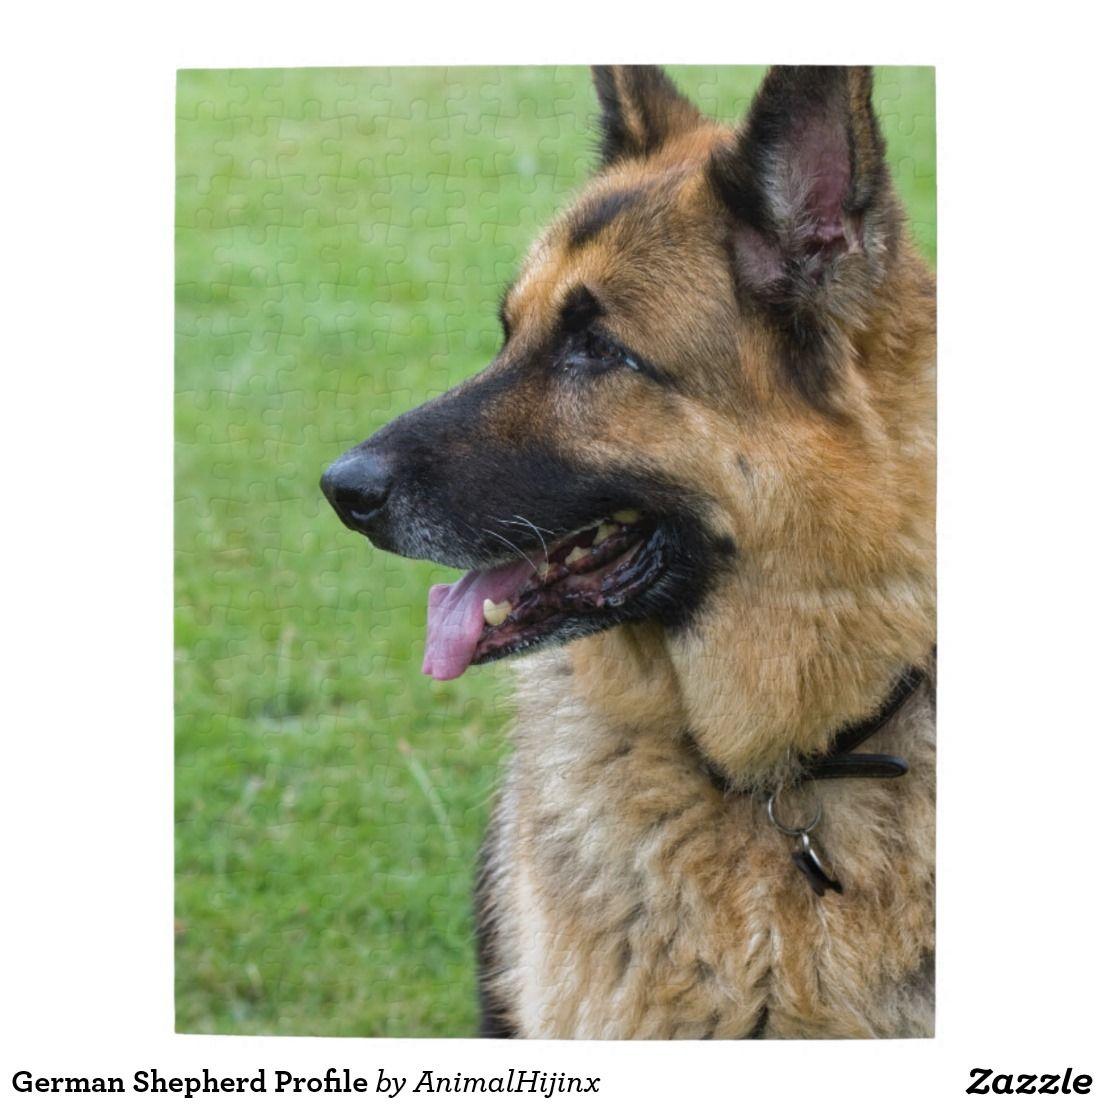 German Shepherd Profile Jigsaw Puzzle Zazzle Com German